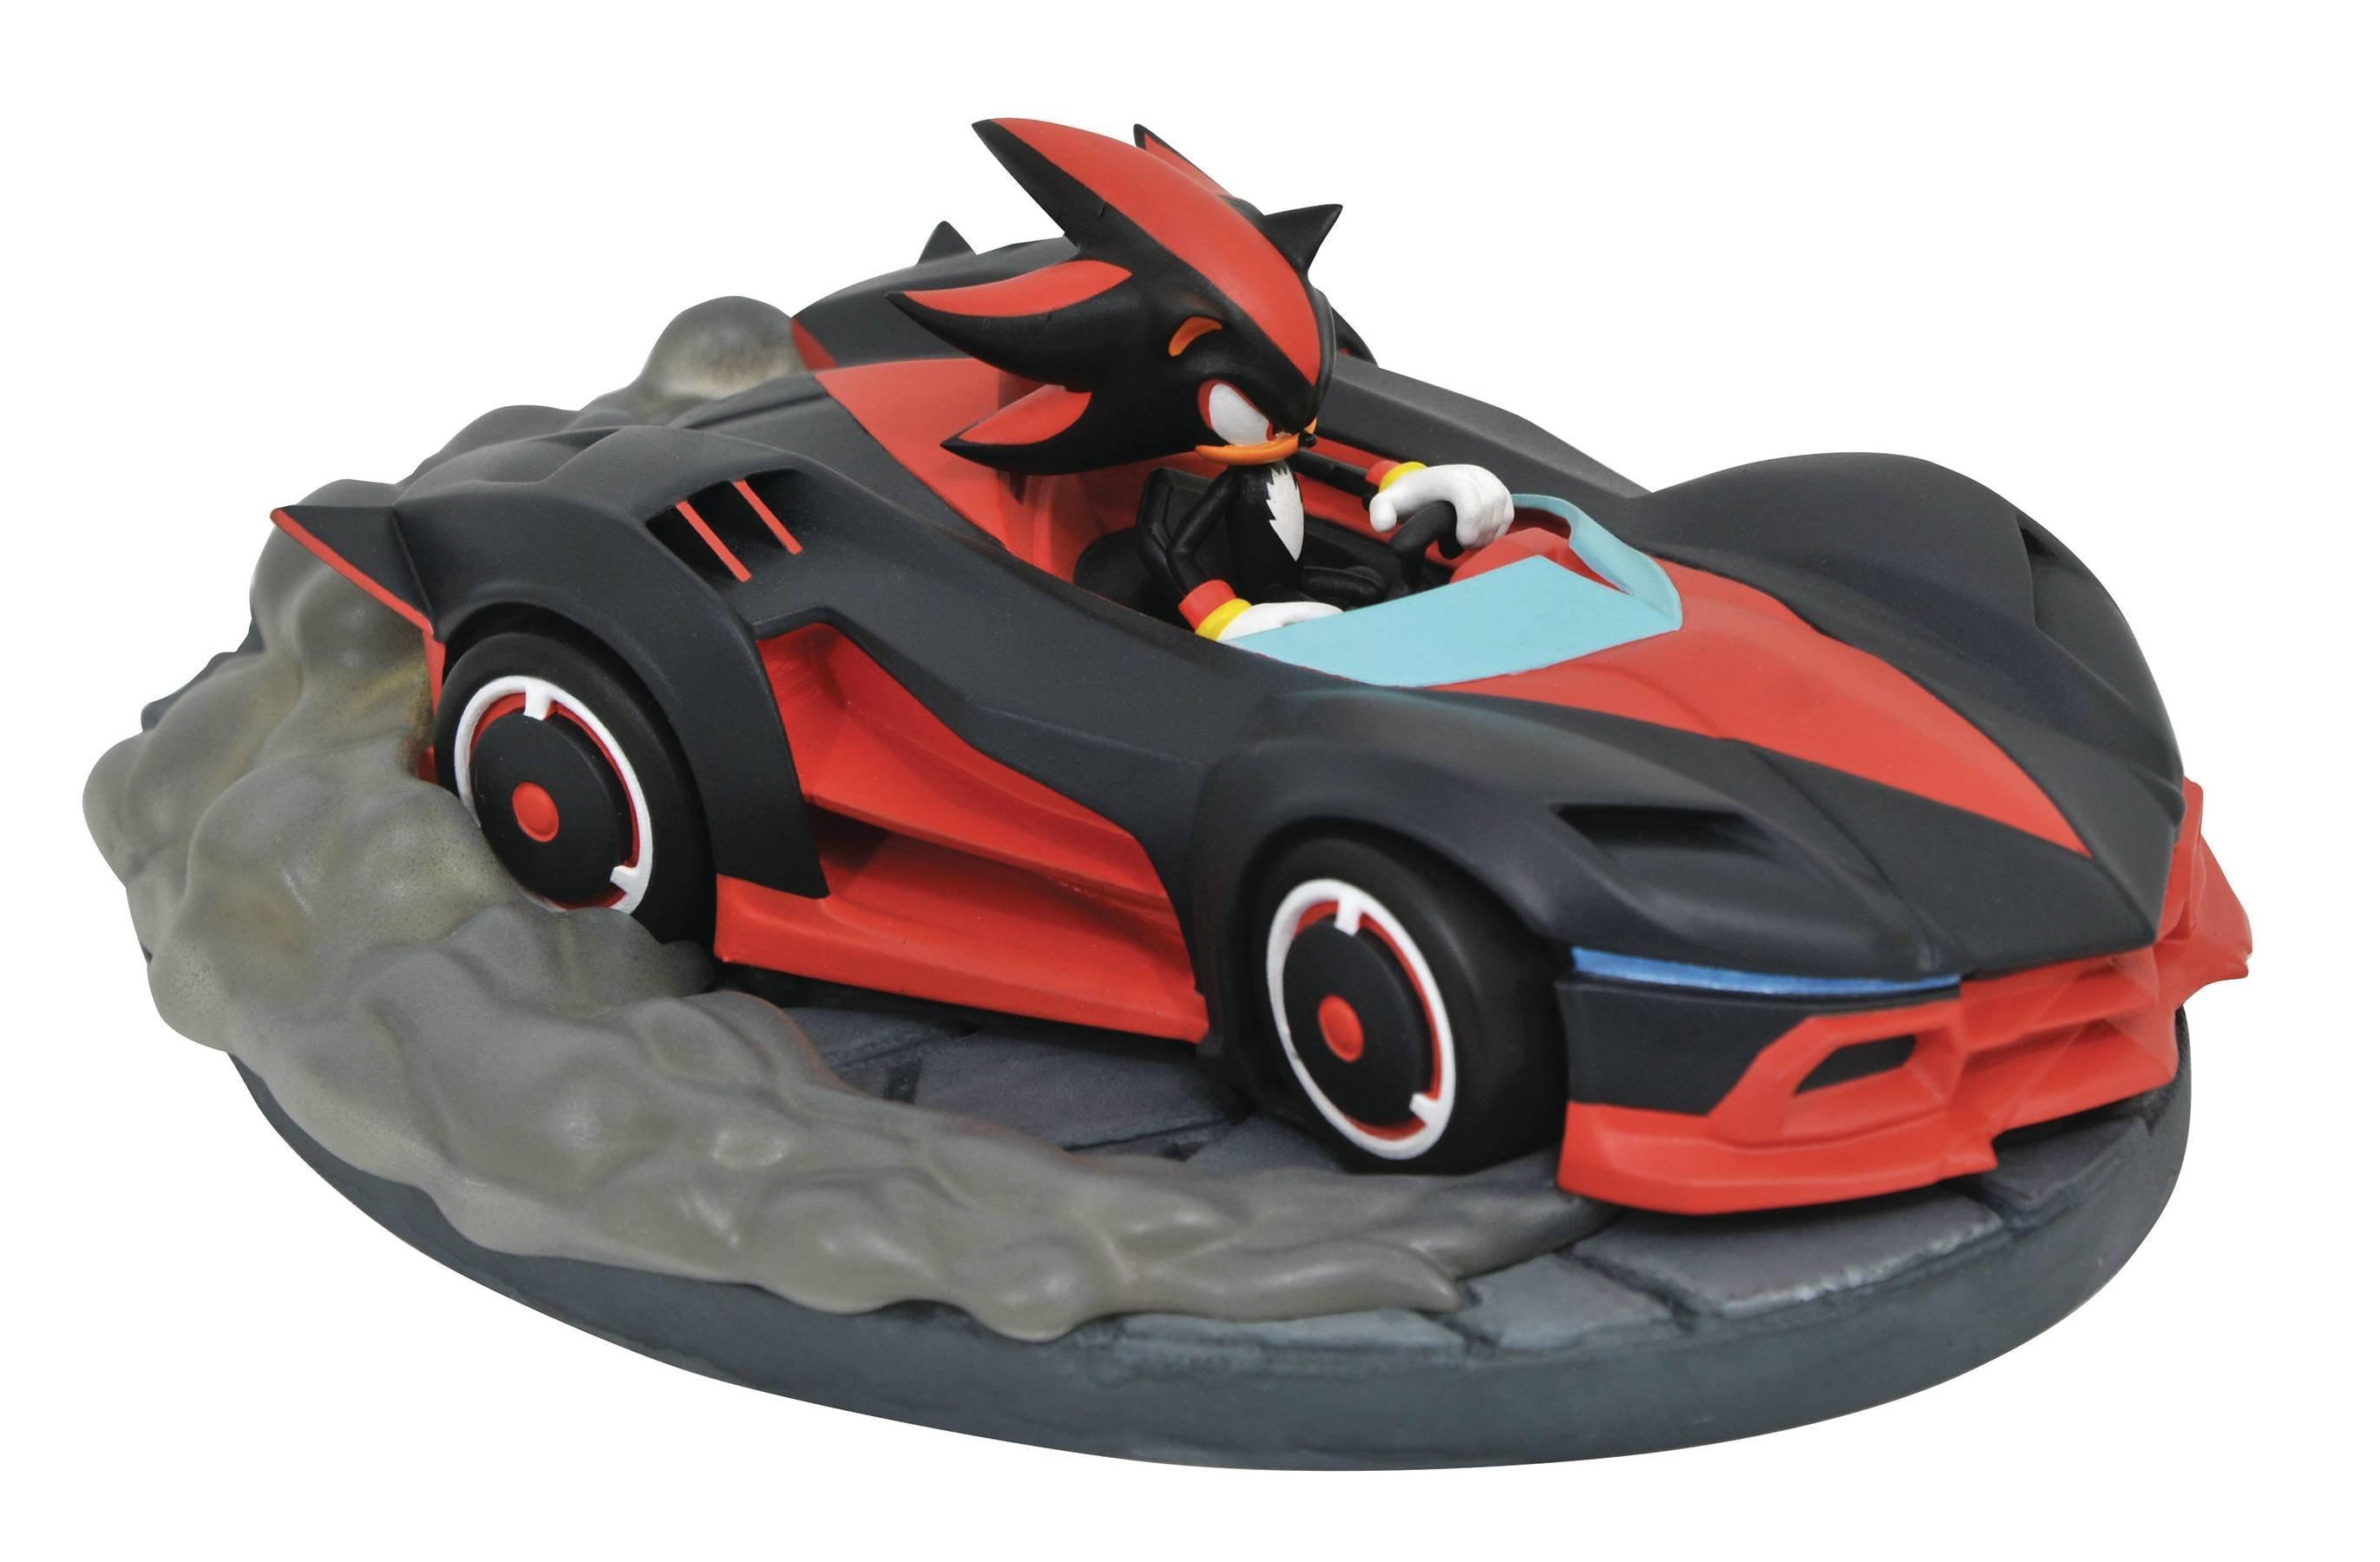 Team Sonic Racing Shadow The Hedgehog Racer Statue Gamestop